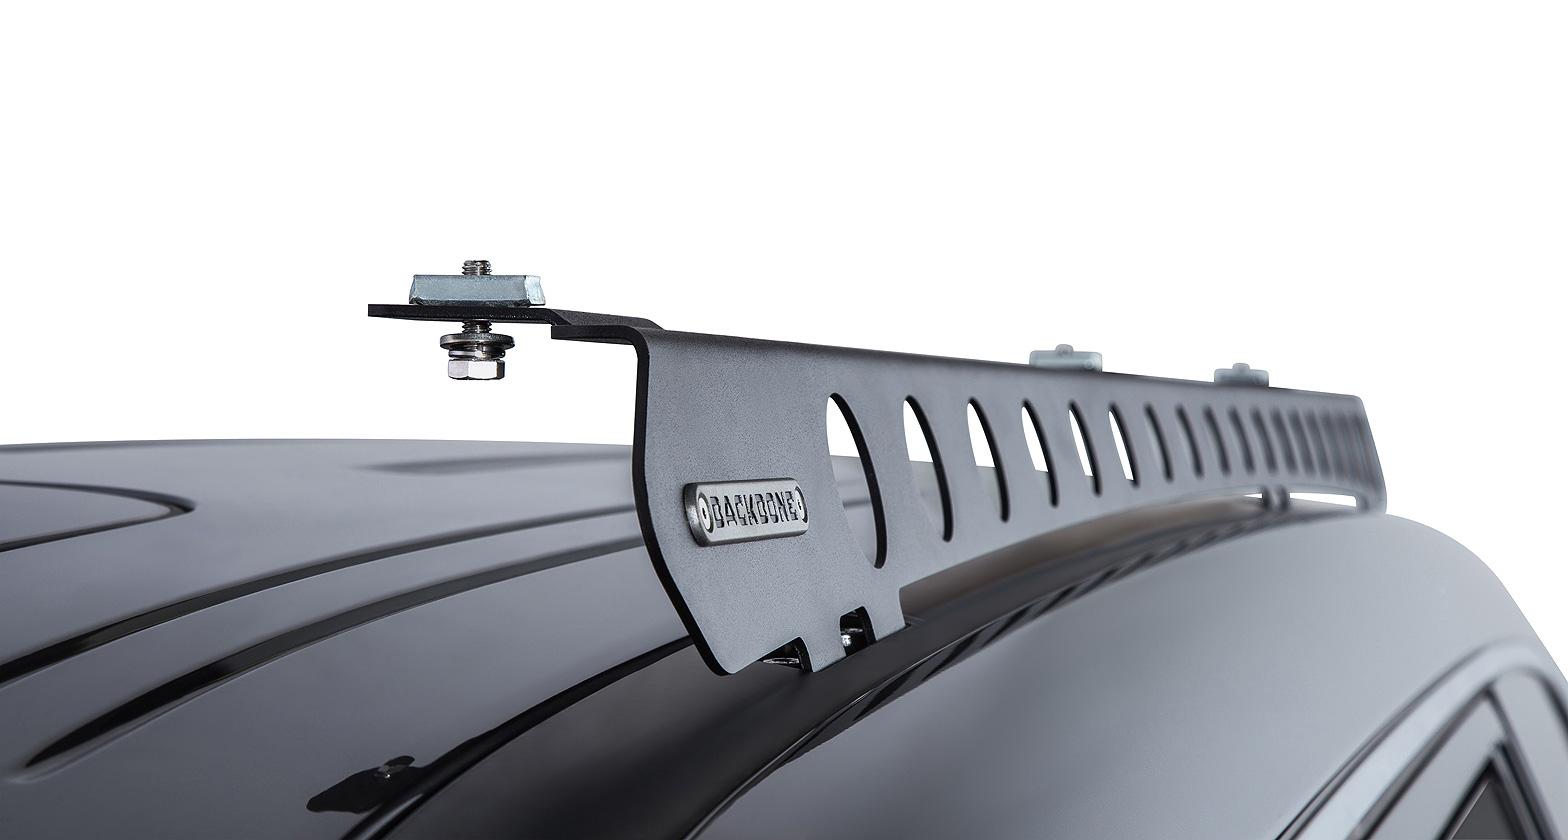 Rnpb1 Rhino Rack Backbone 3 Base Mounting System